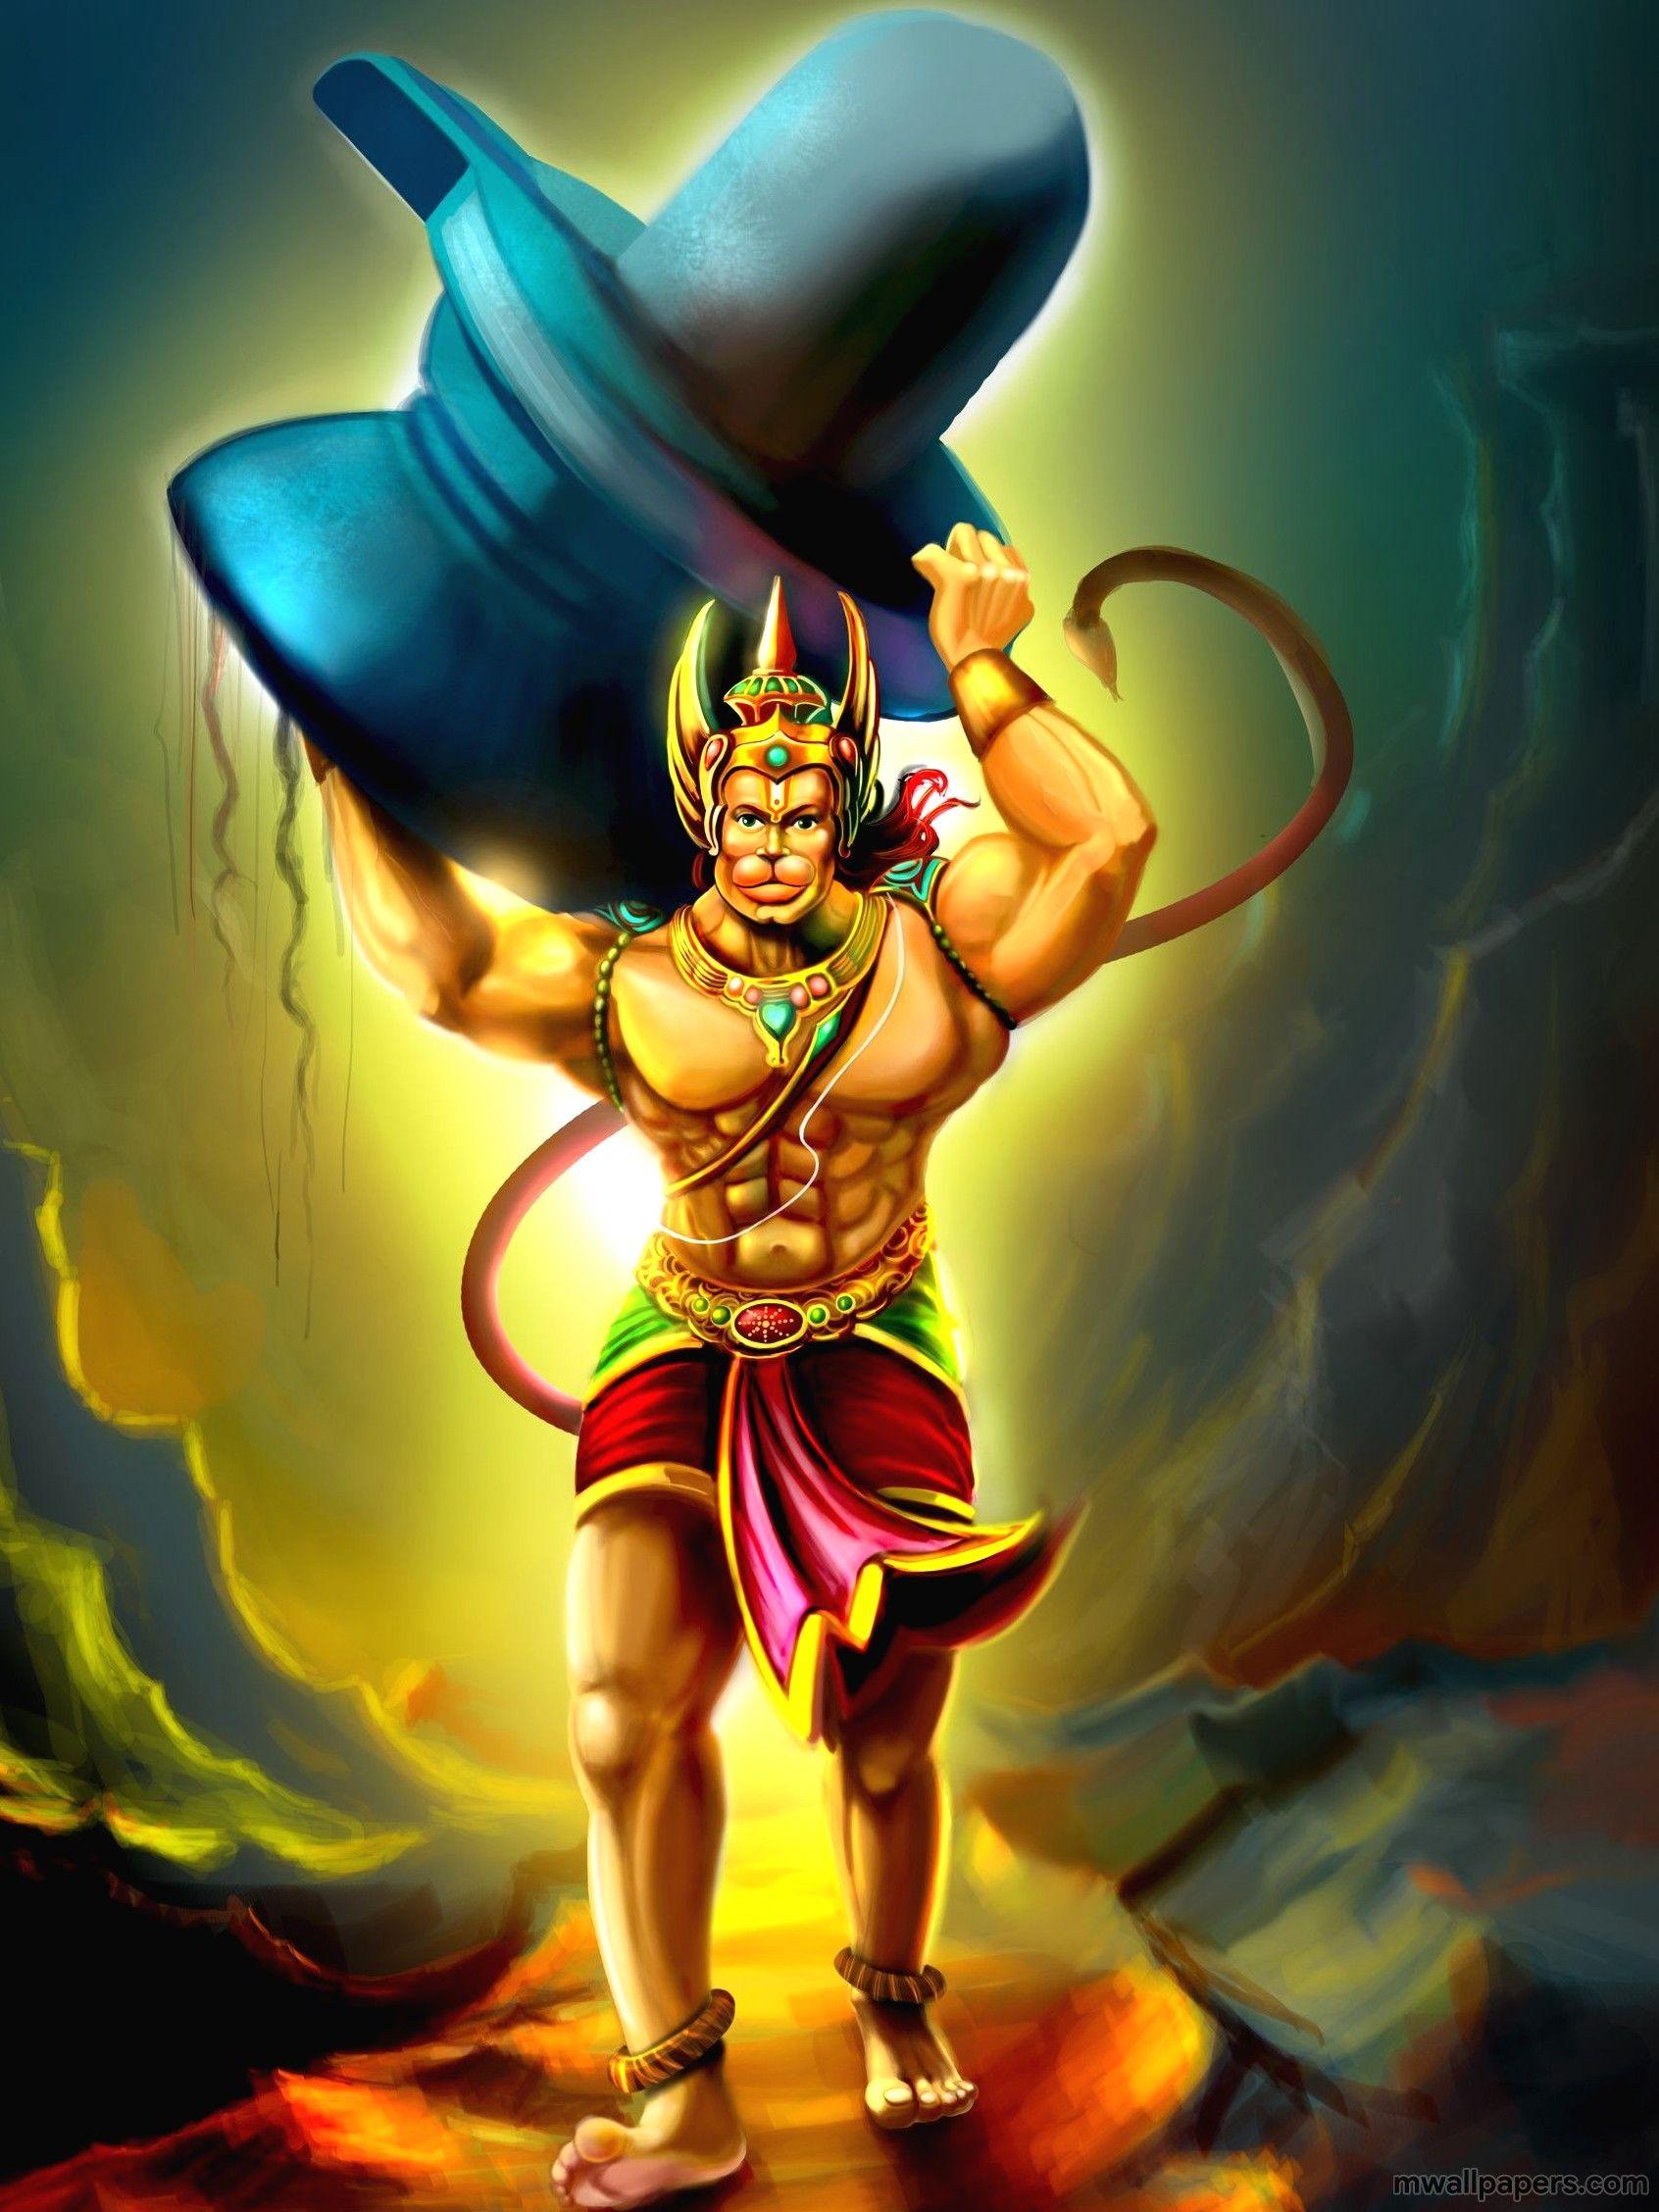 Hanuman Animated Hd Wallpaper Group Pictures 65 Lord Hanuman